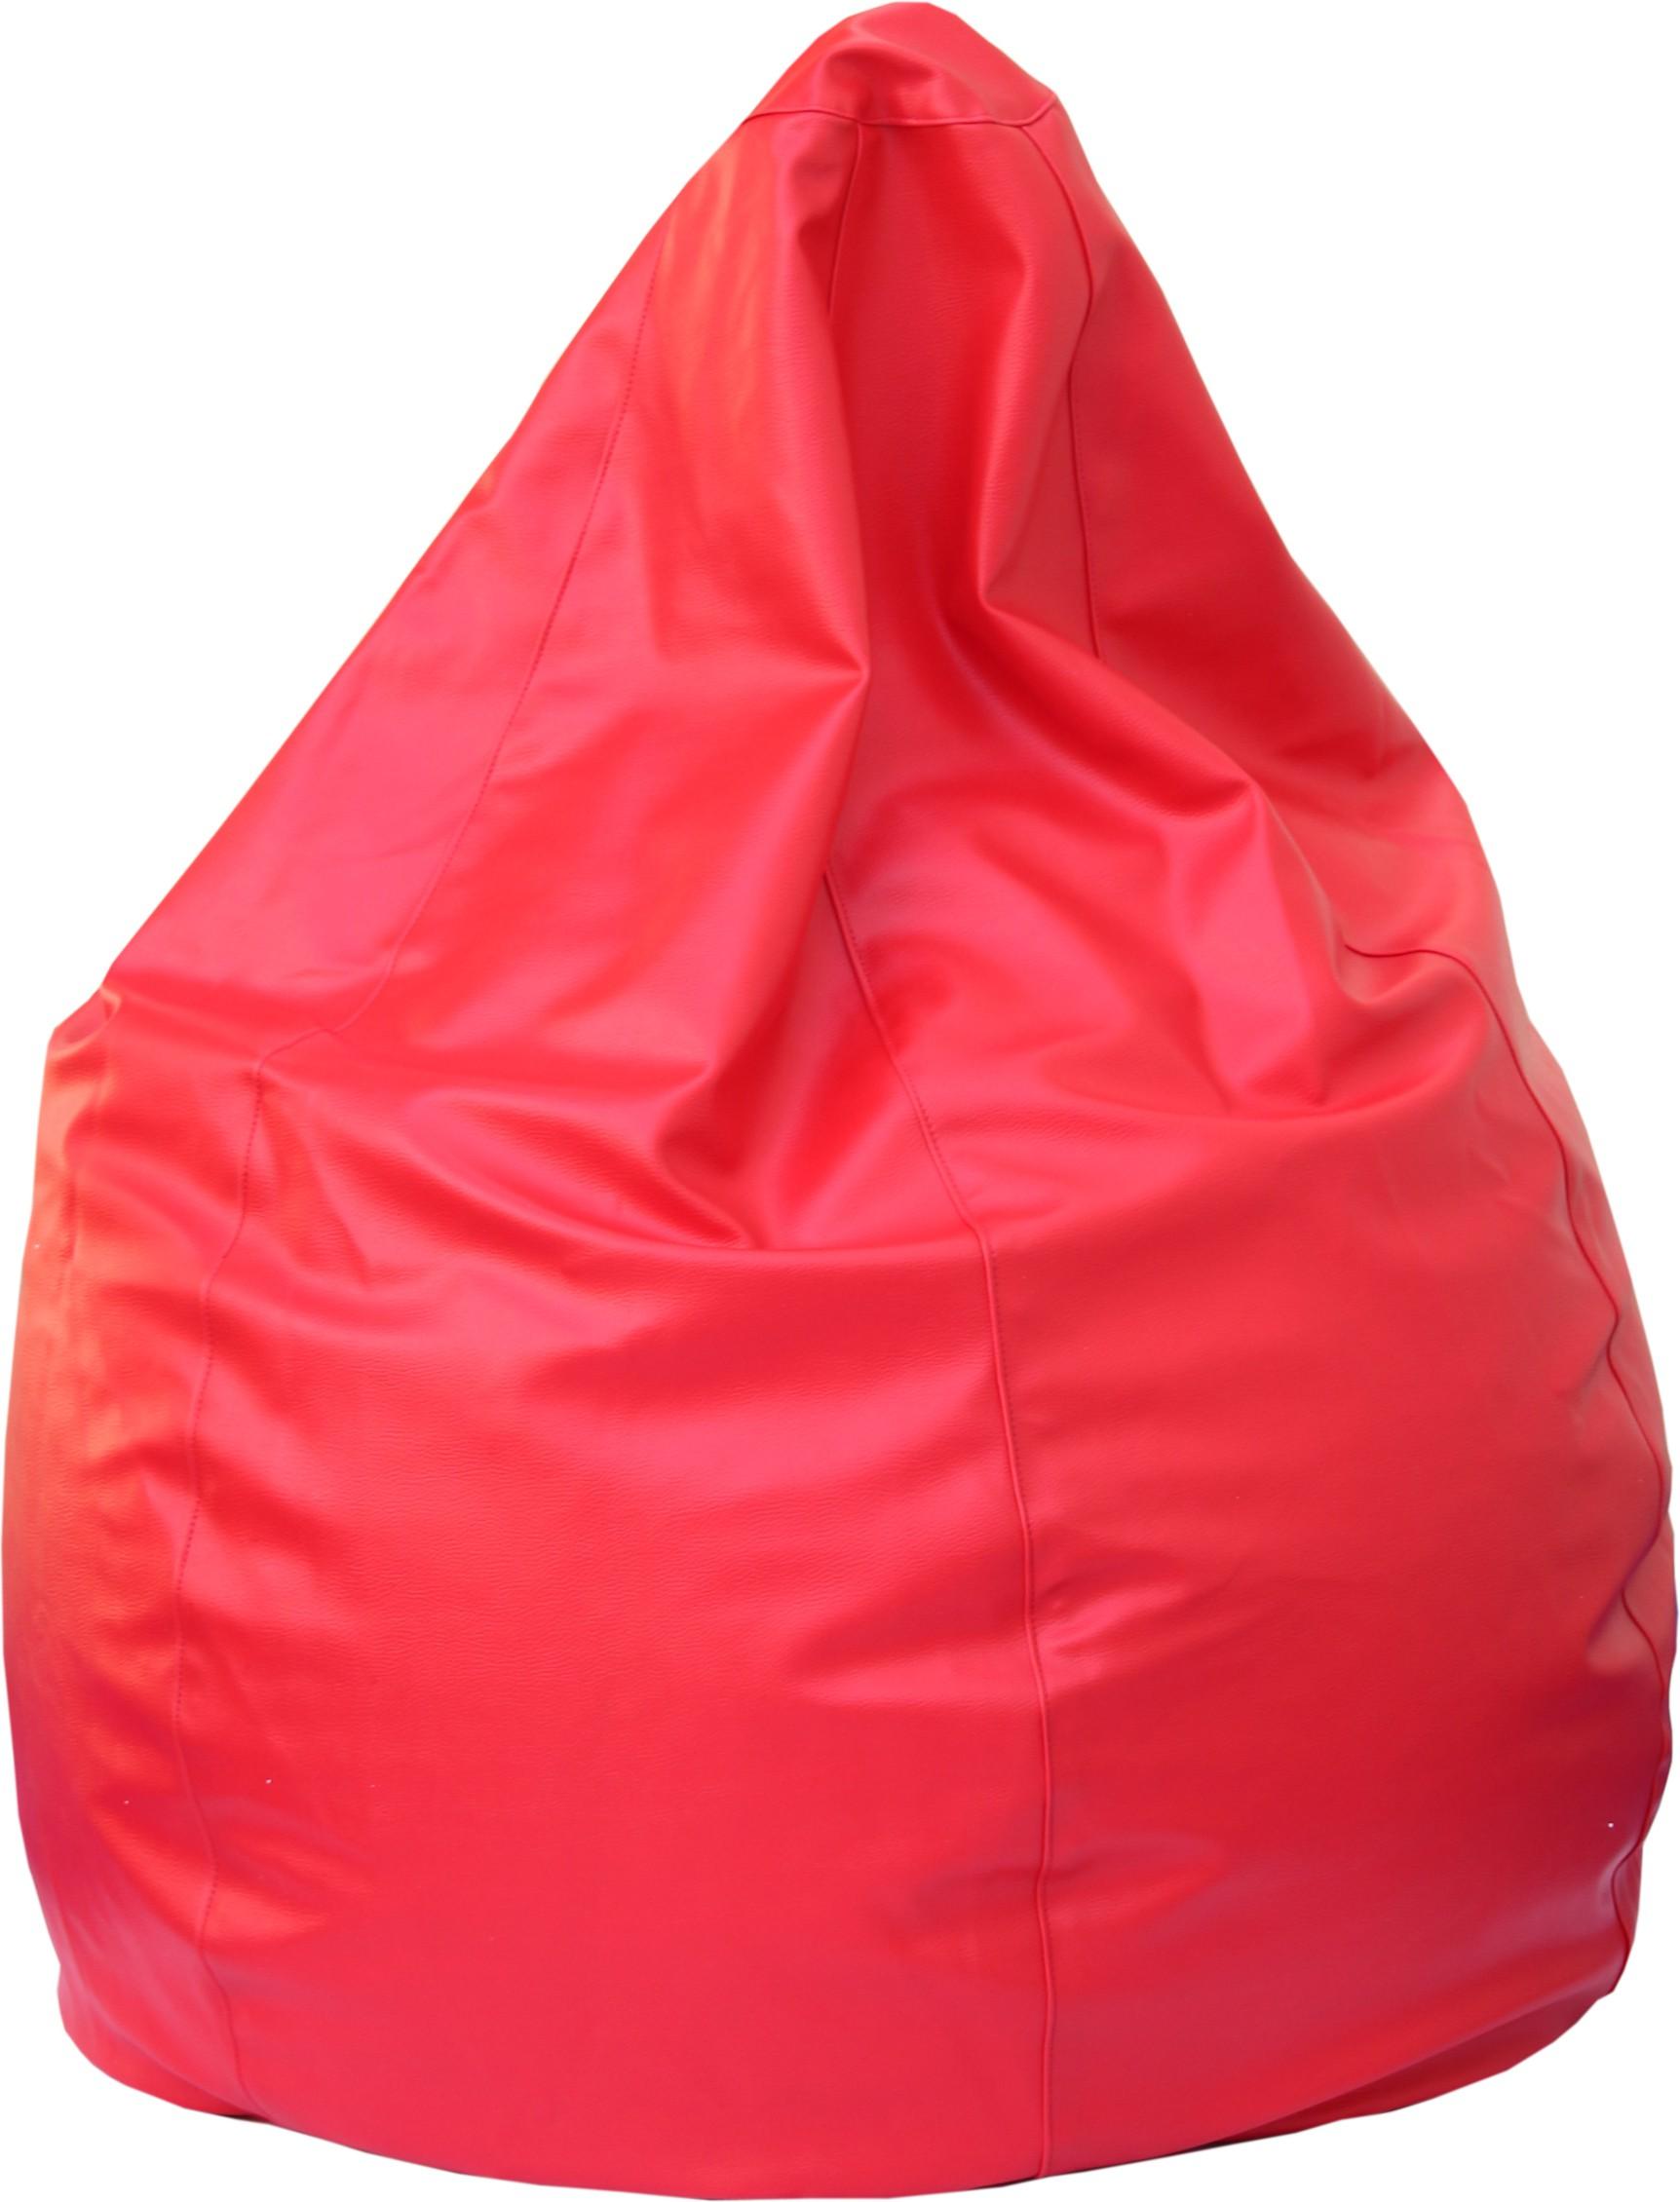 View Beanskart XXL Bean Bag  With Bean Filling(Red) Furniture (Beanskart)